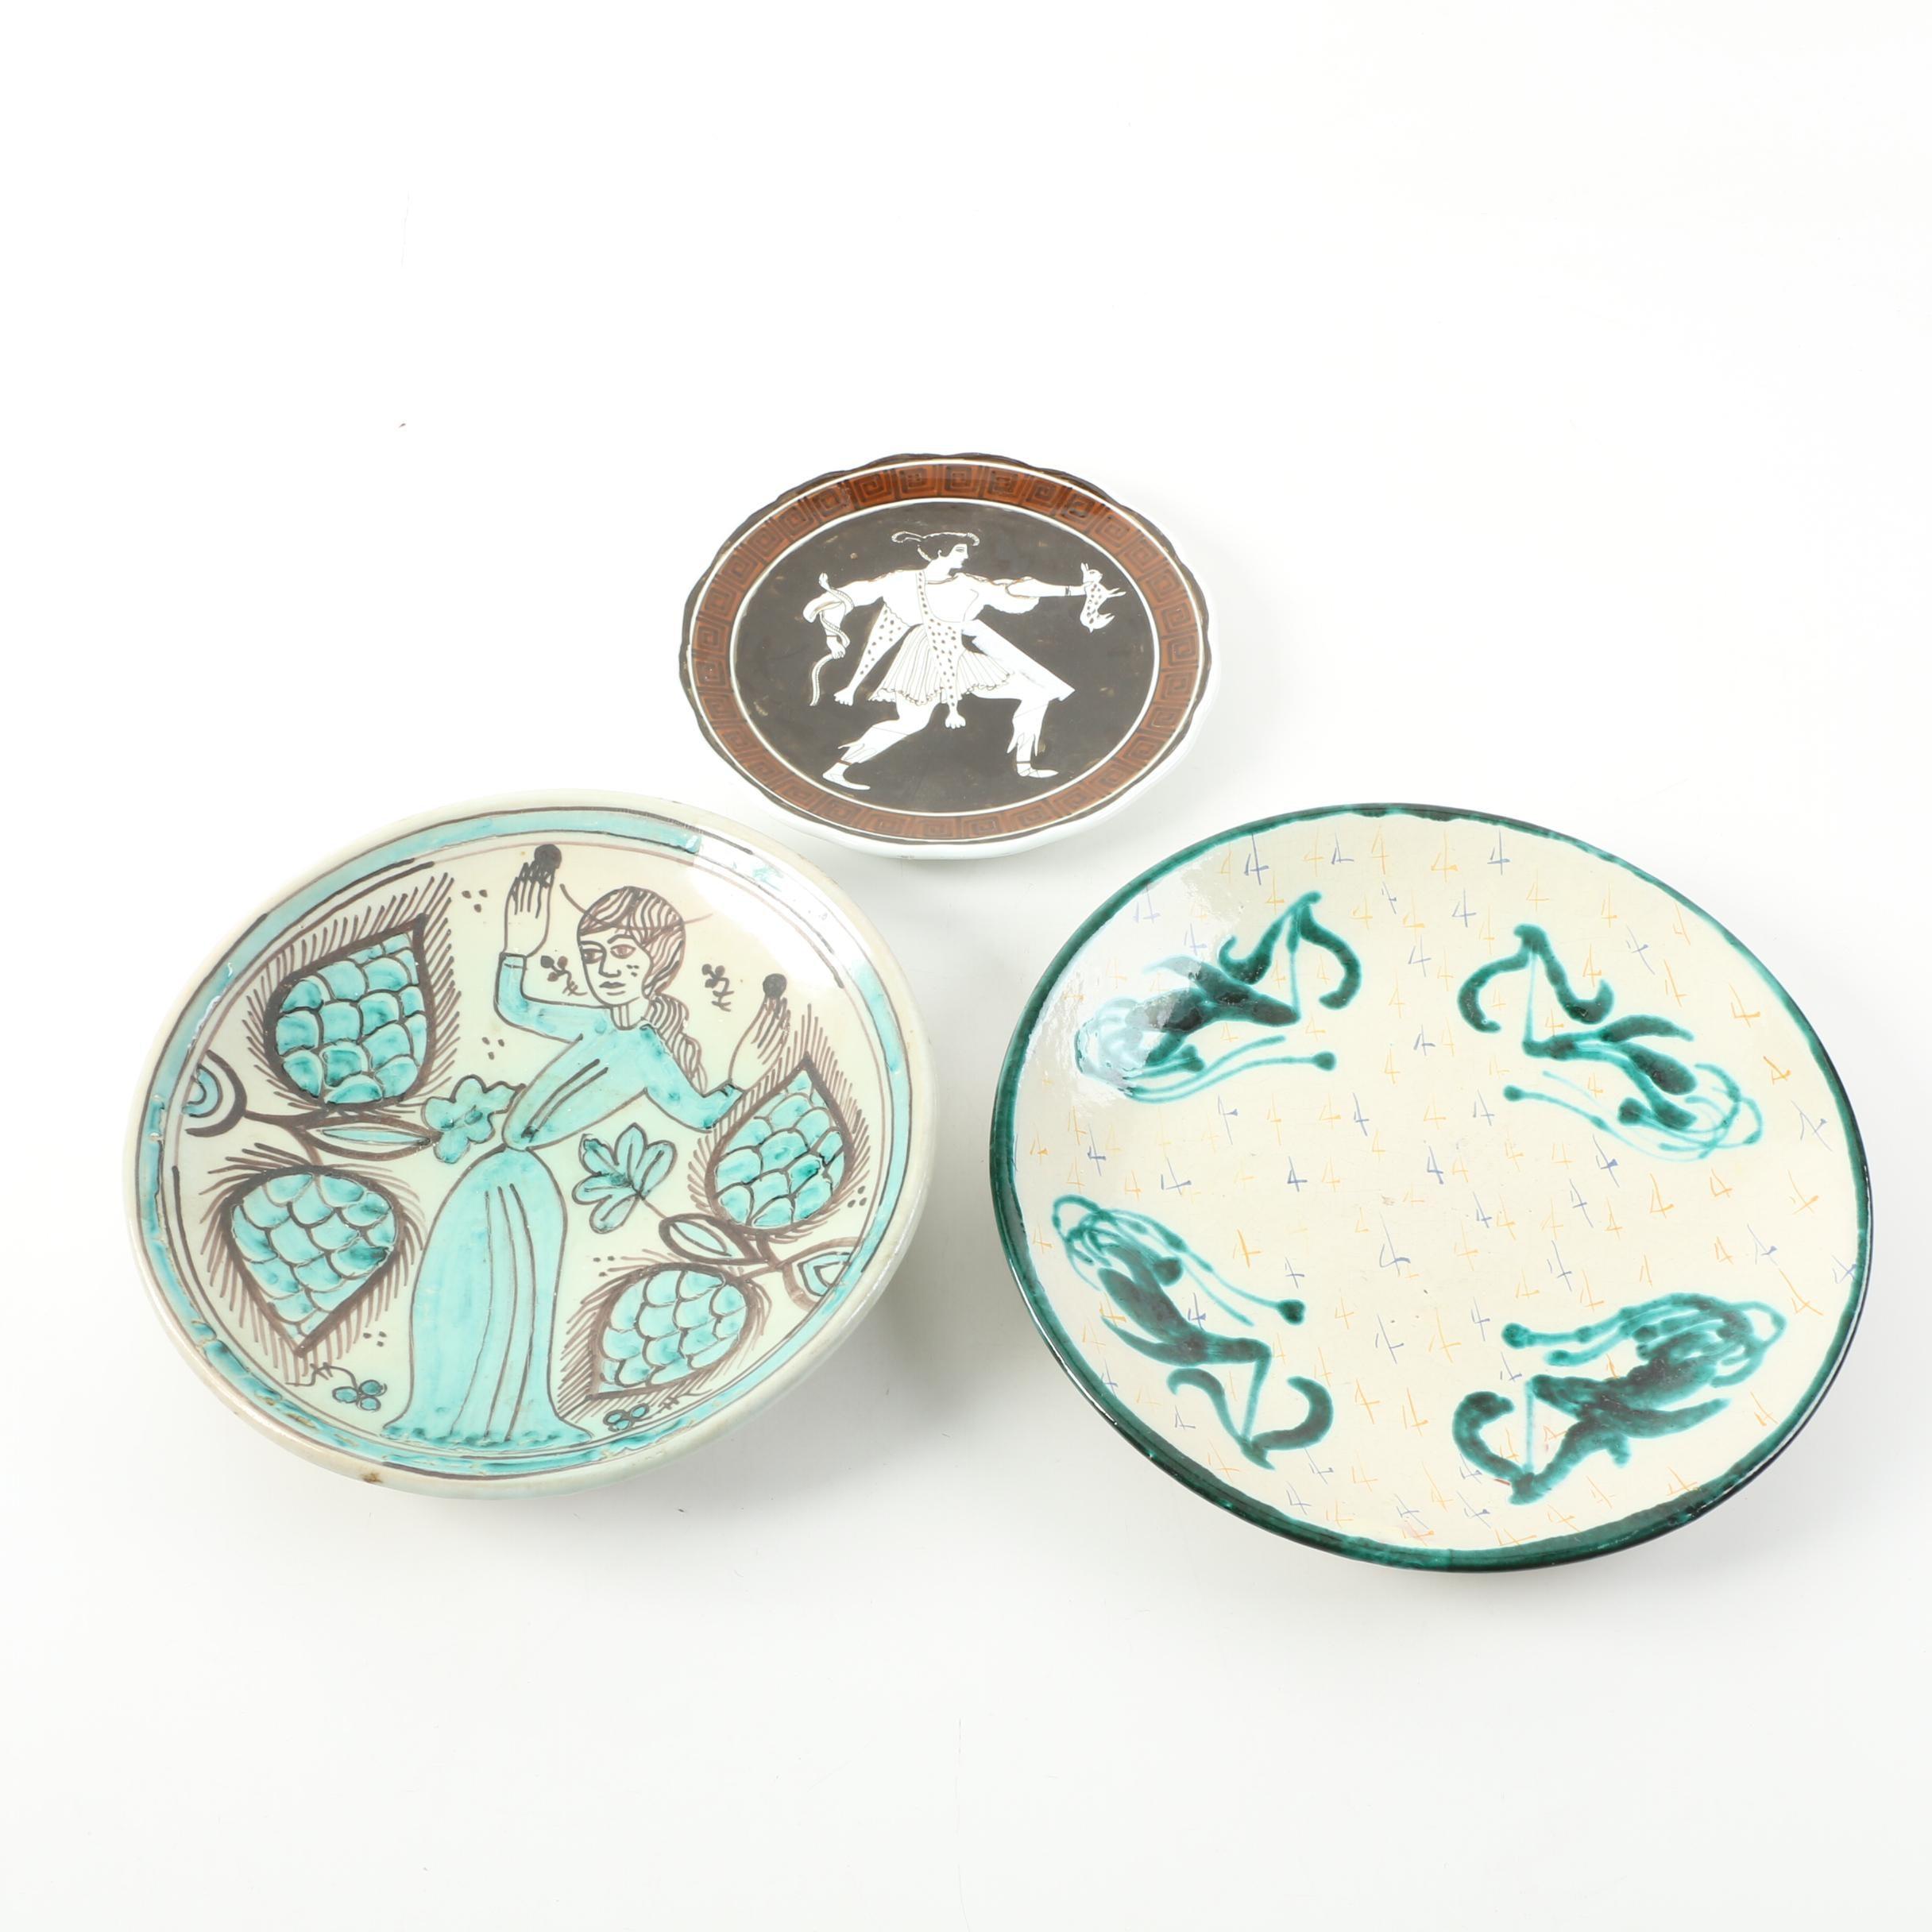 Decorative Hand Painted Ceramic Plates